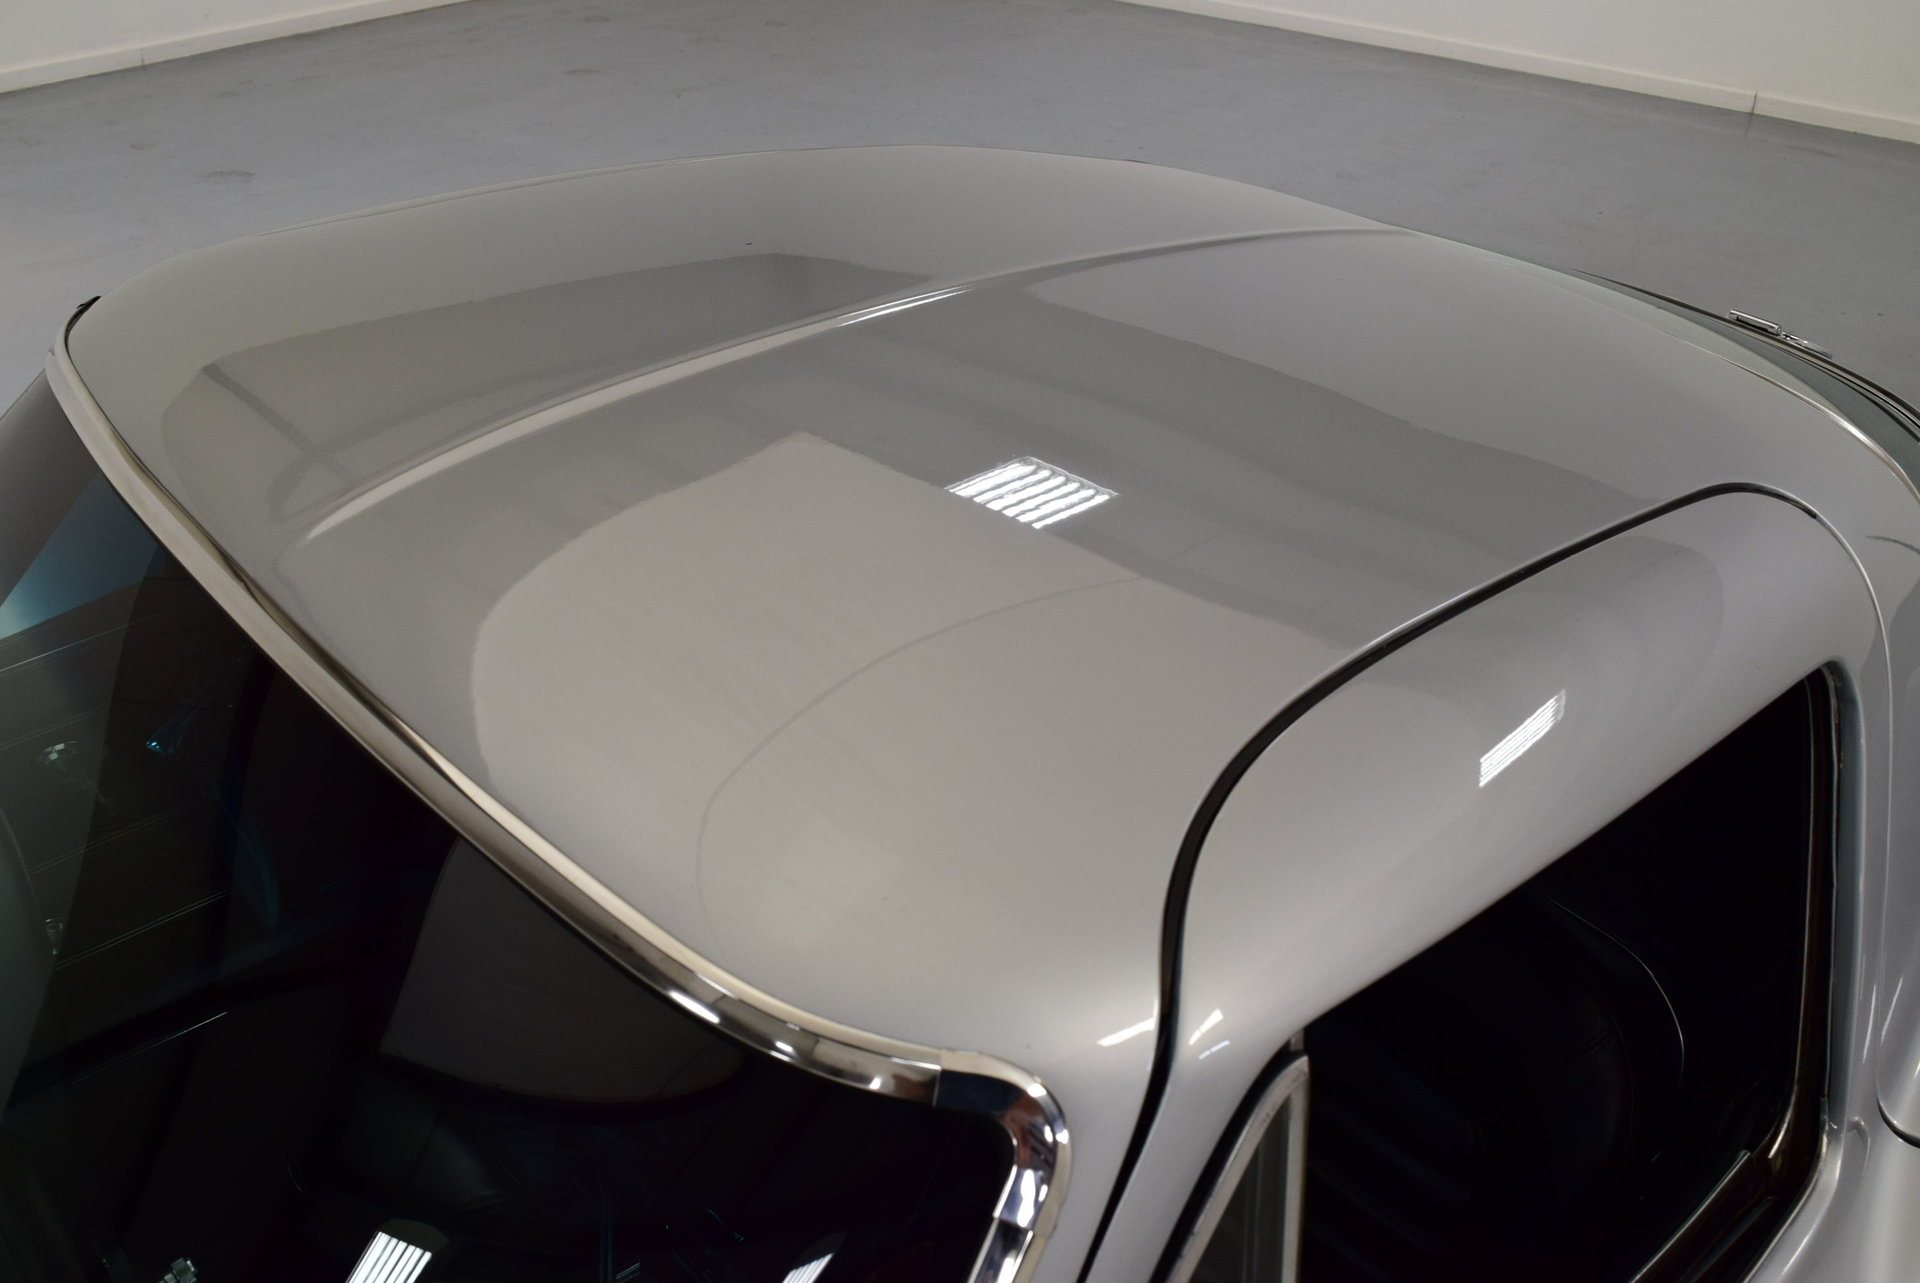 1966 Chevrolet Corvette Shelton Classics Performance Chevy Stingray